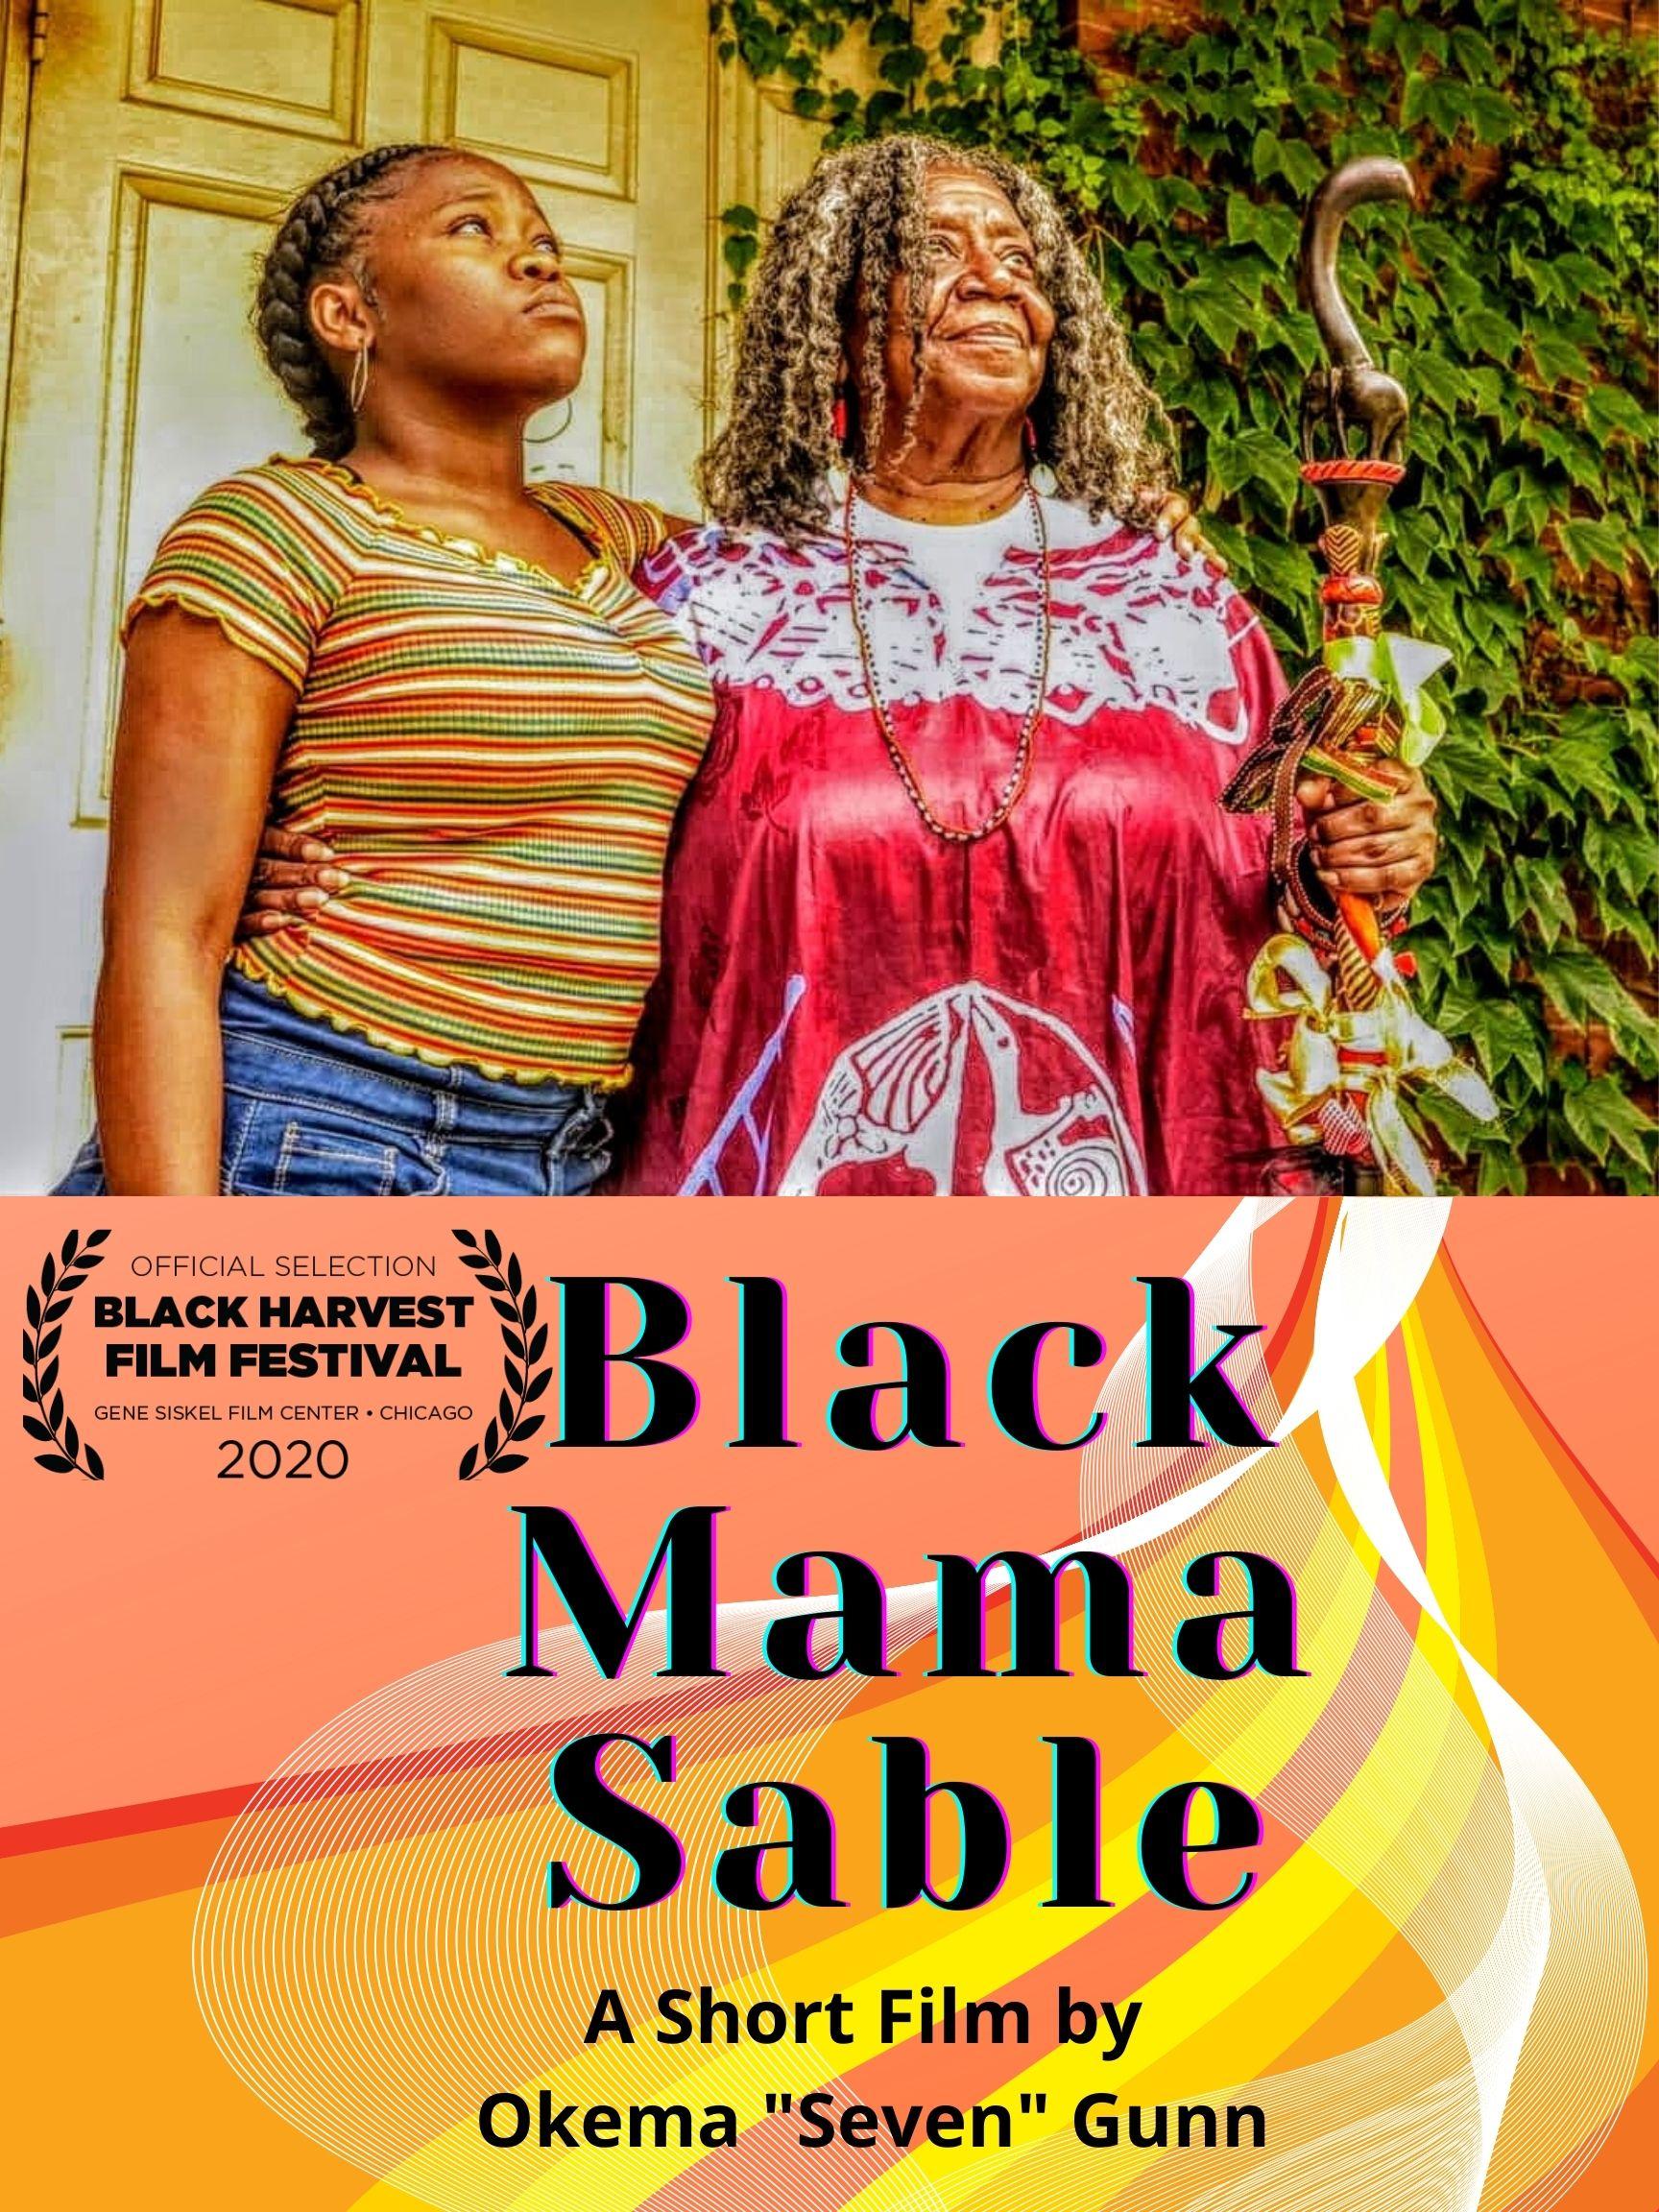 26th Annual Black Harvest Film Festival World Premiere: